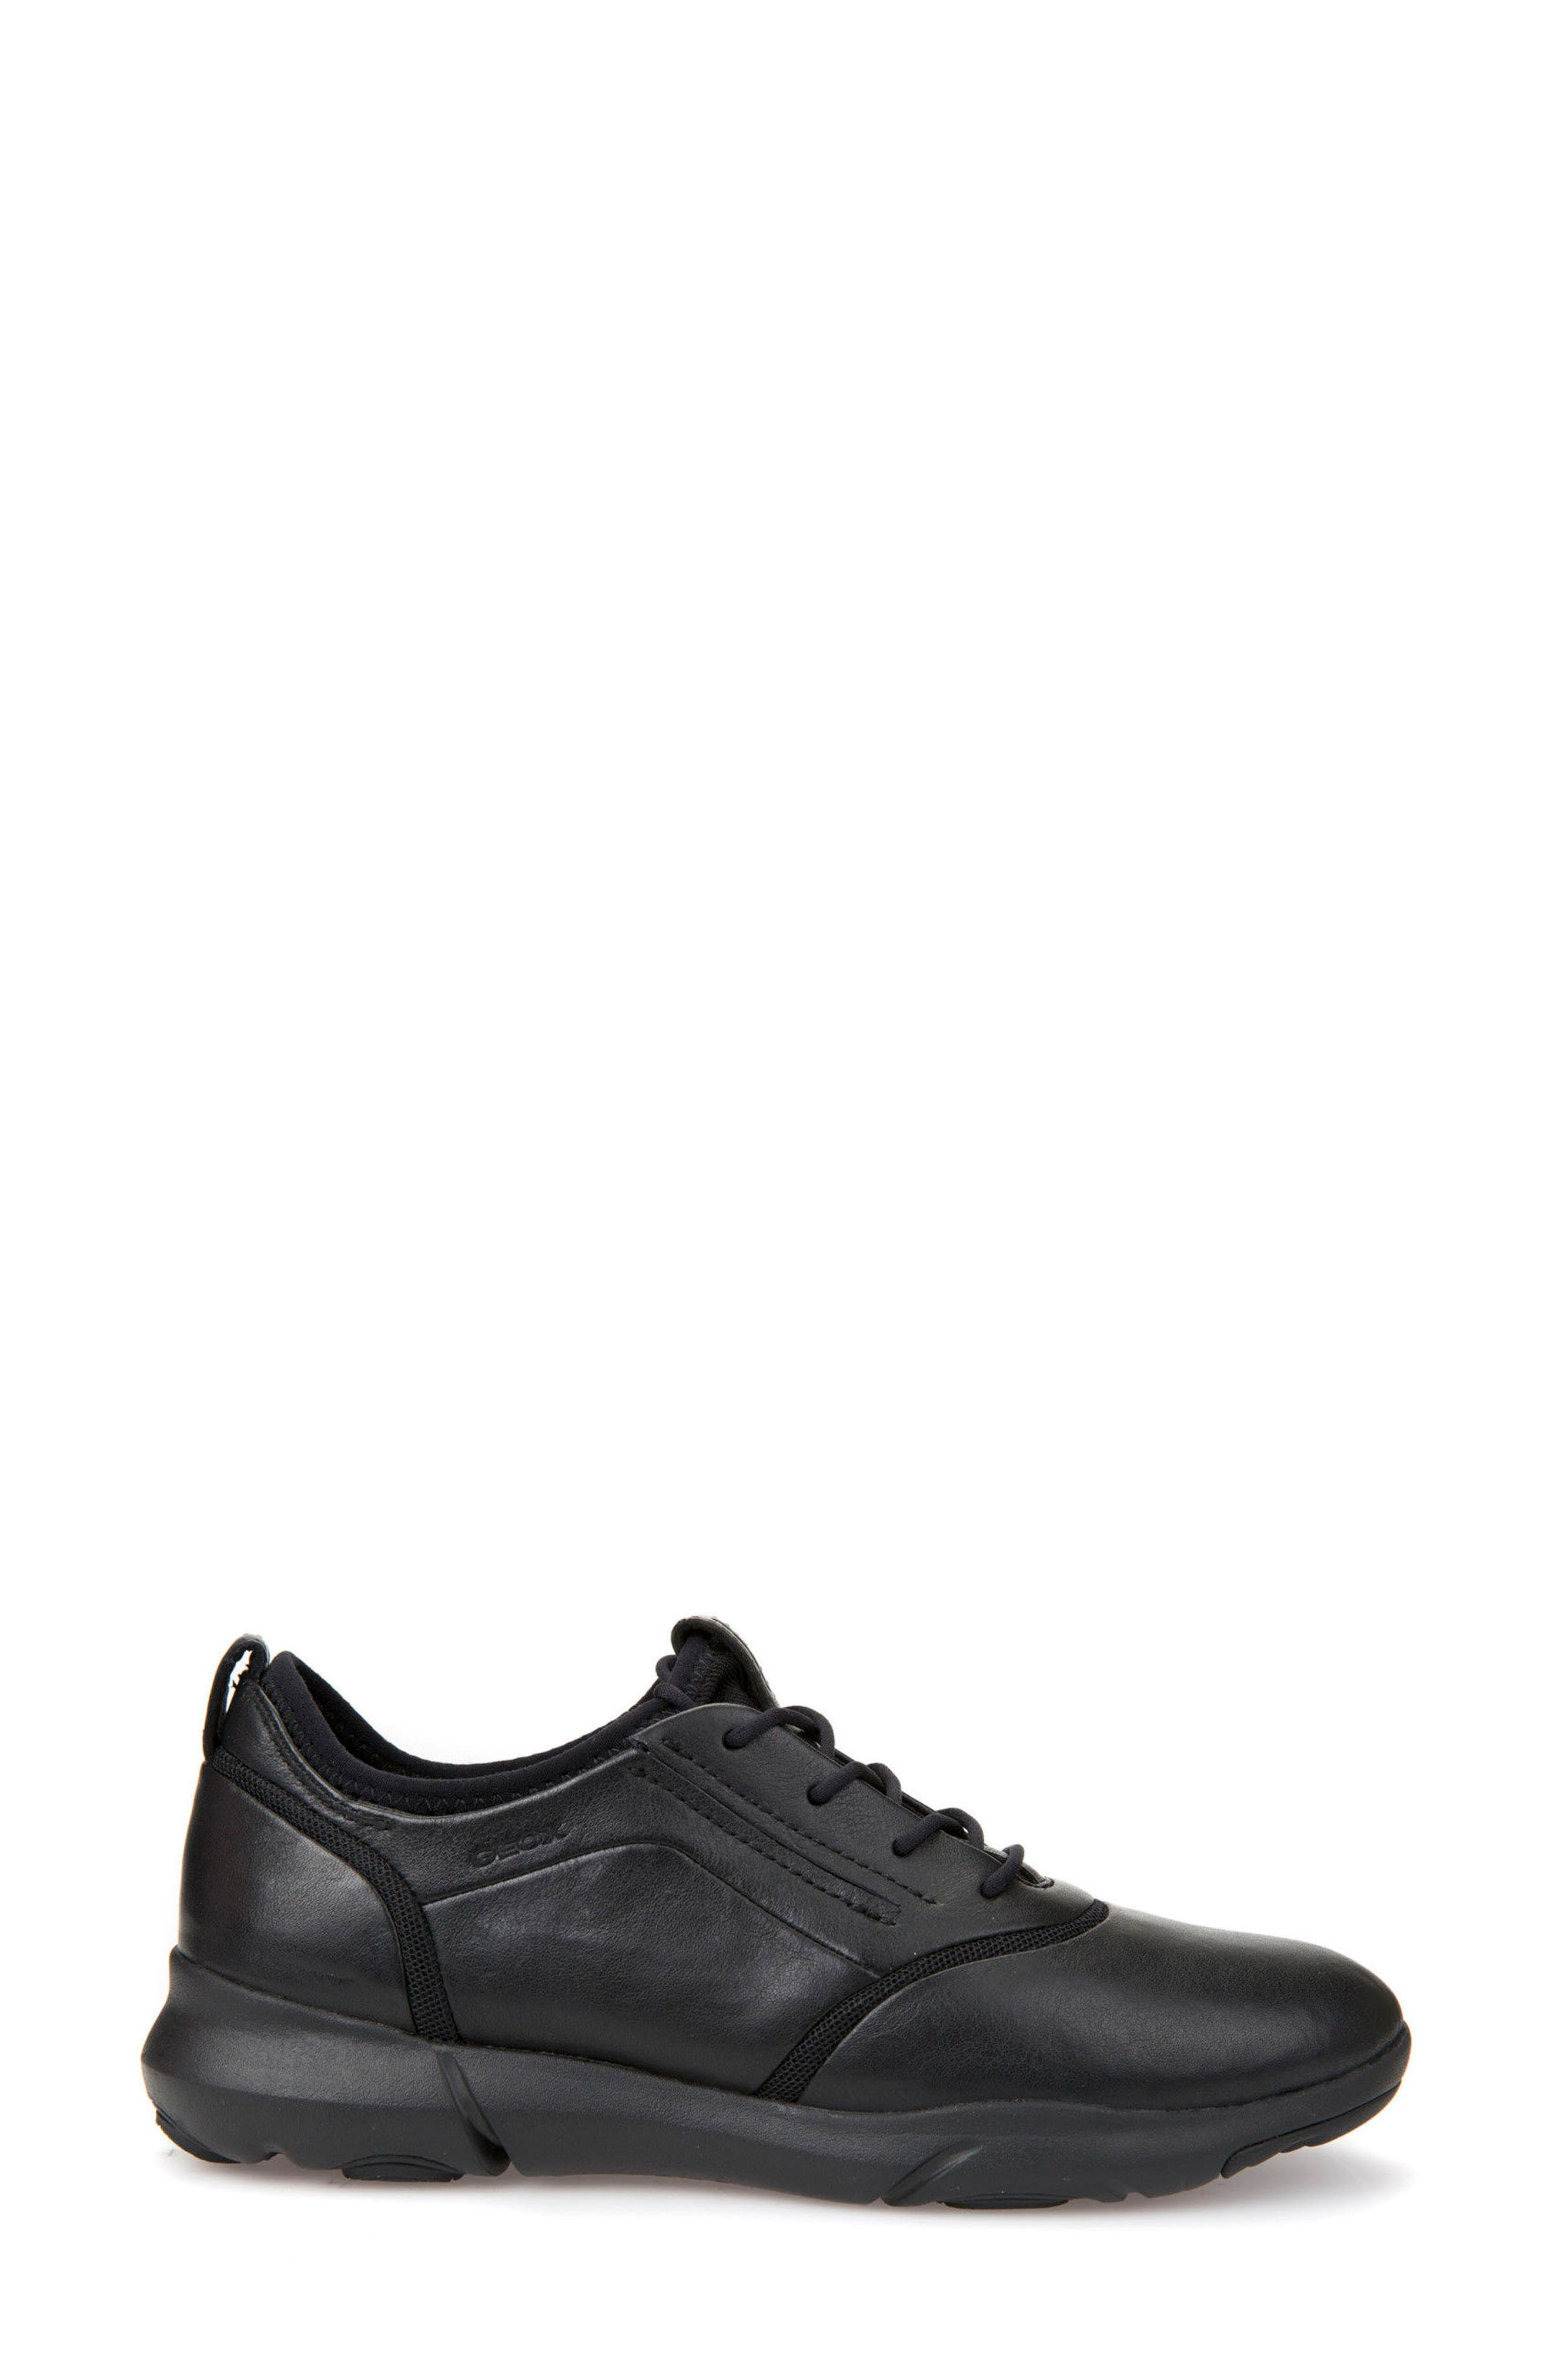 Nebula S 2 Low Top Sneaker,                             Alternate thumbnail 3, color,                             001